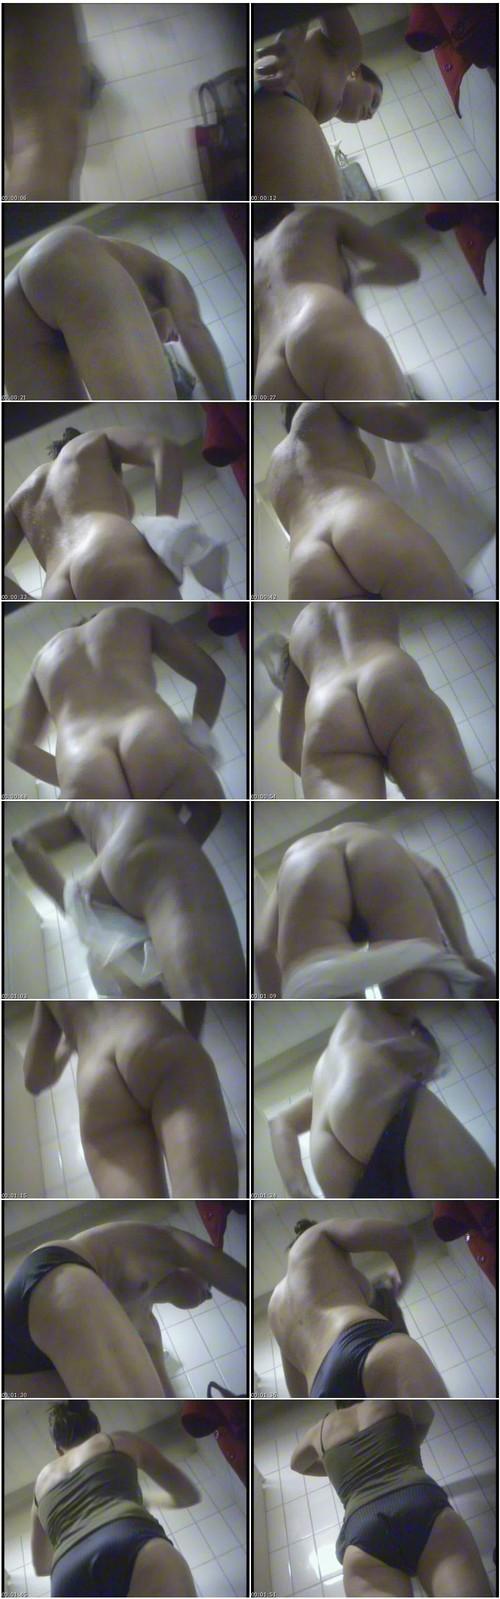 http://ist5-1.filesor.com/pimpandhost.com/9/6/8/3/96838/6/j/m/L/6jmLy/poolvid192_thumb_m.jpg